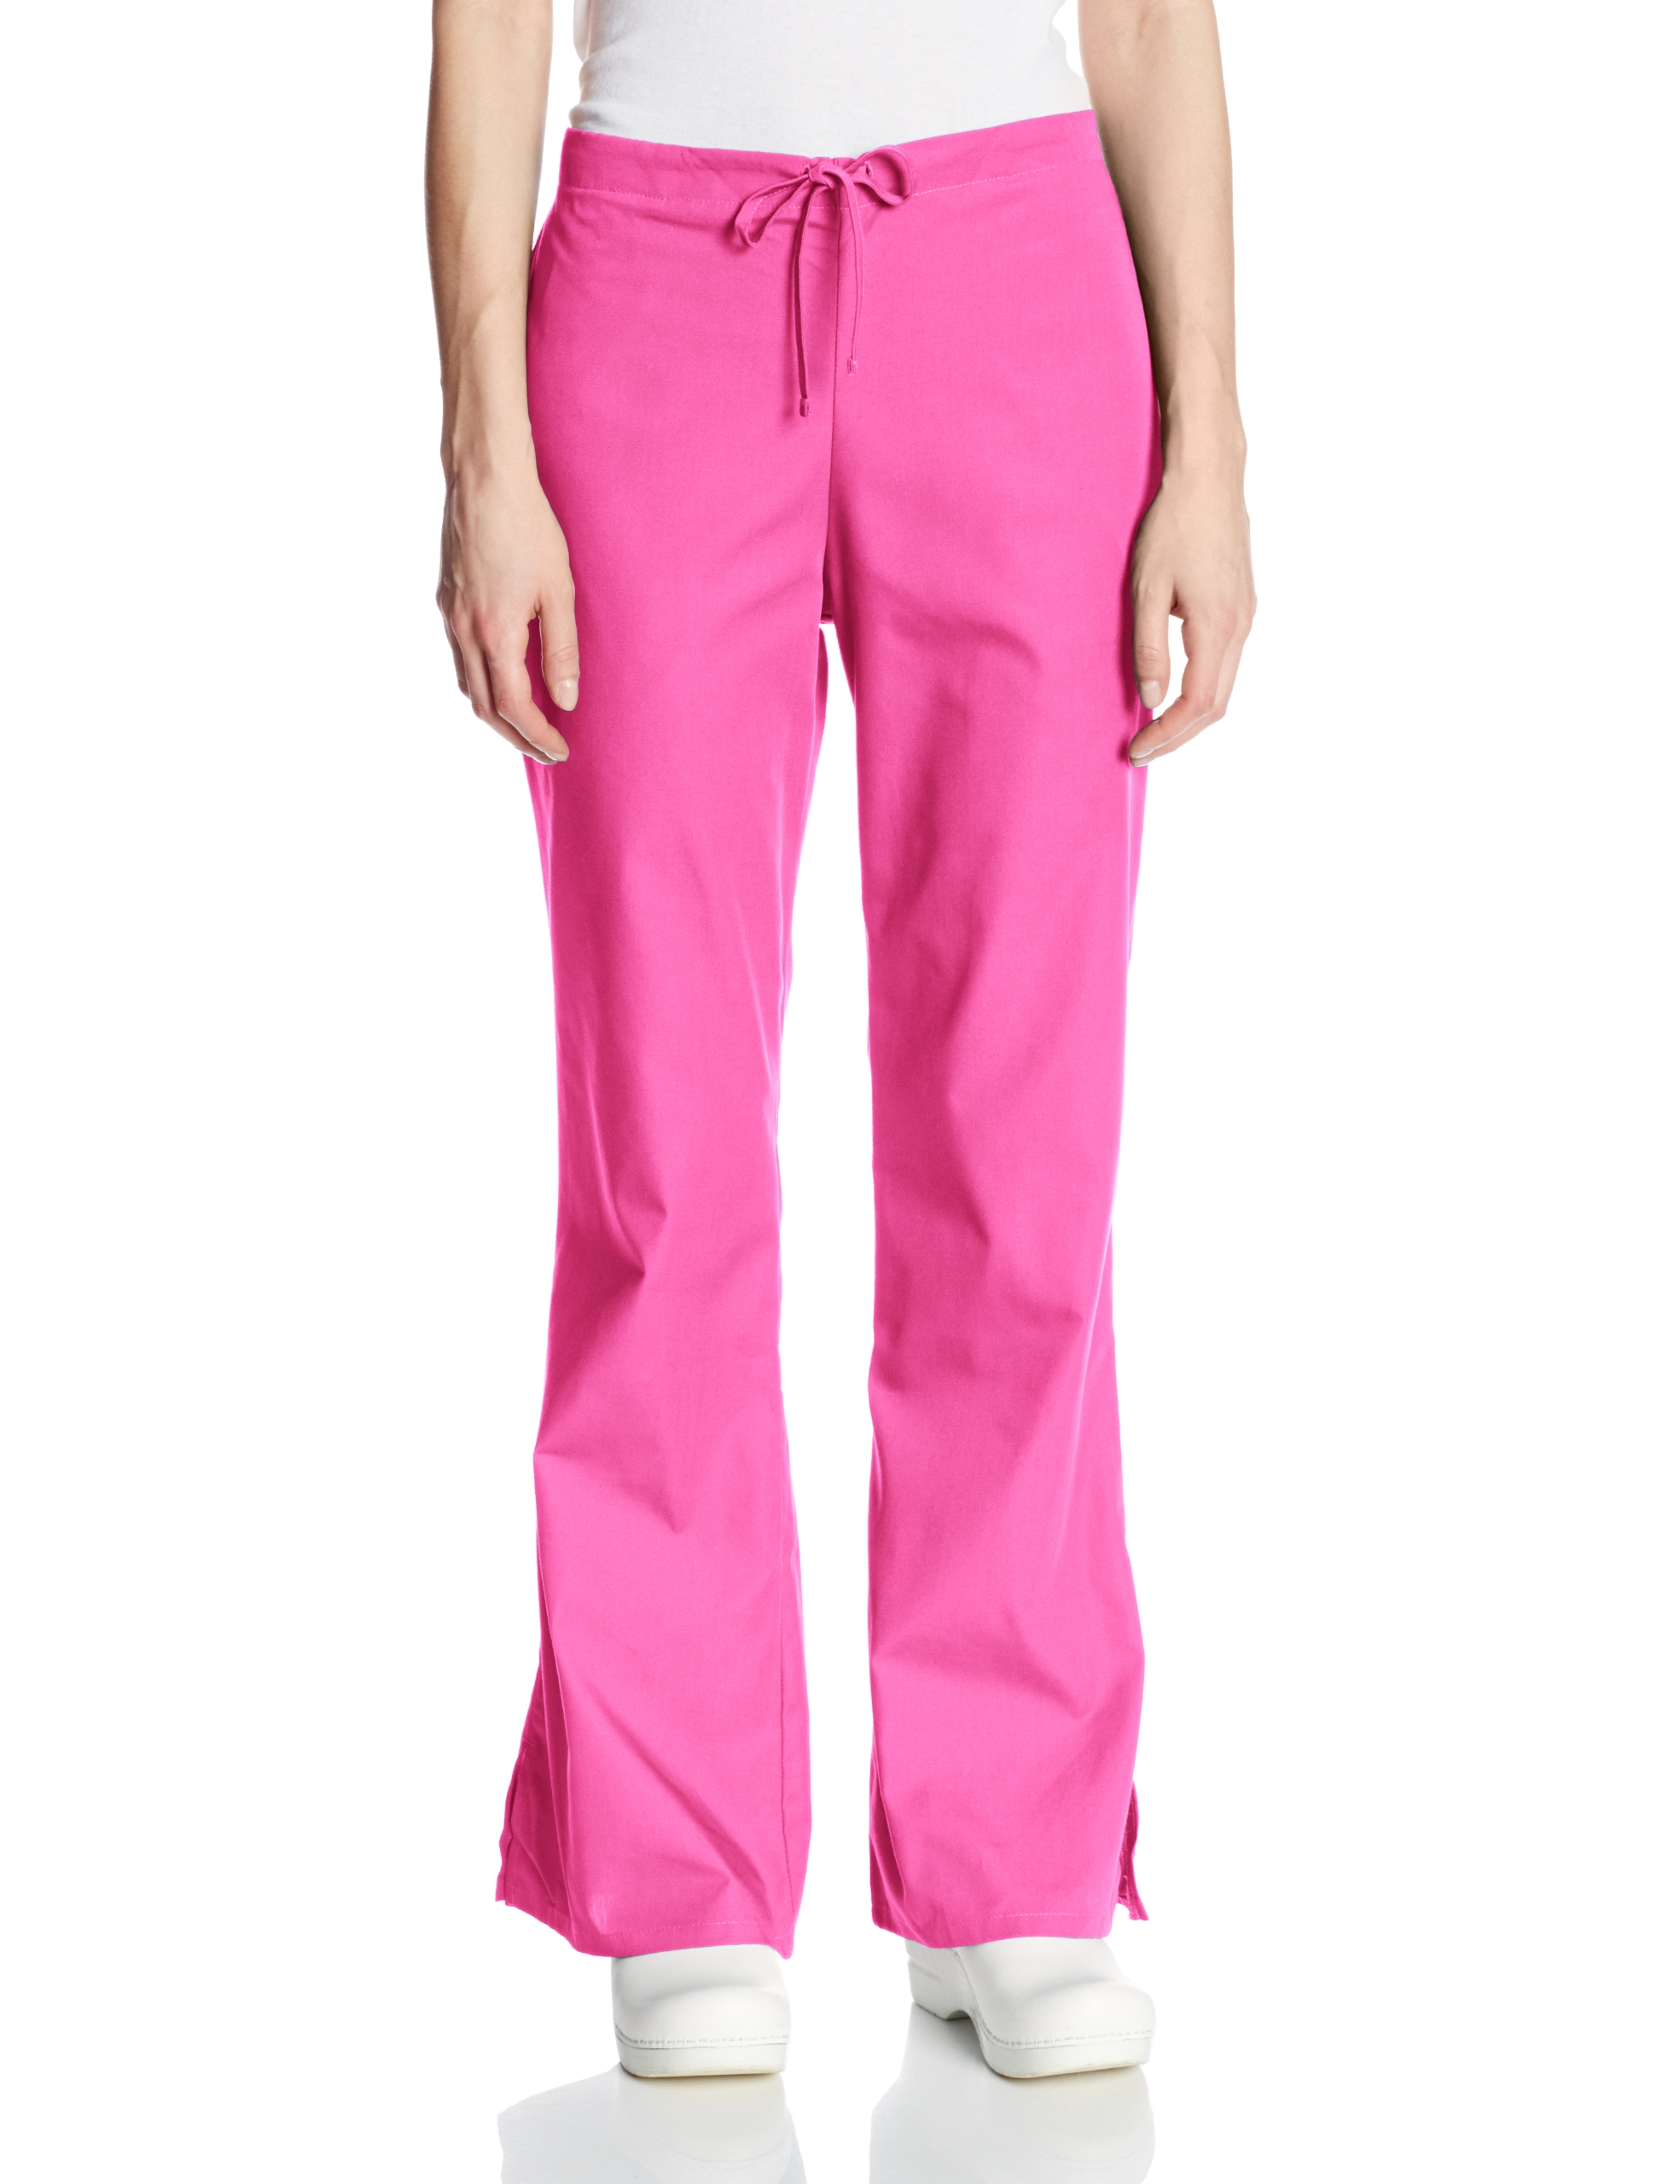 Cherokee Women's Plus Size Flare Leg Drawstring Scrub Pant, Shocking Pink, XXX-Large Tall